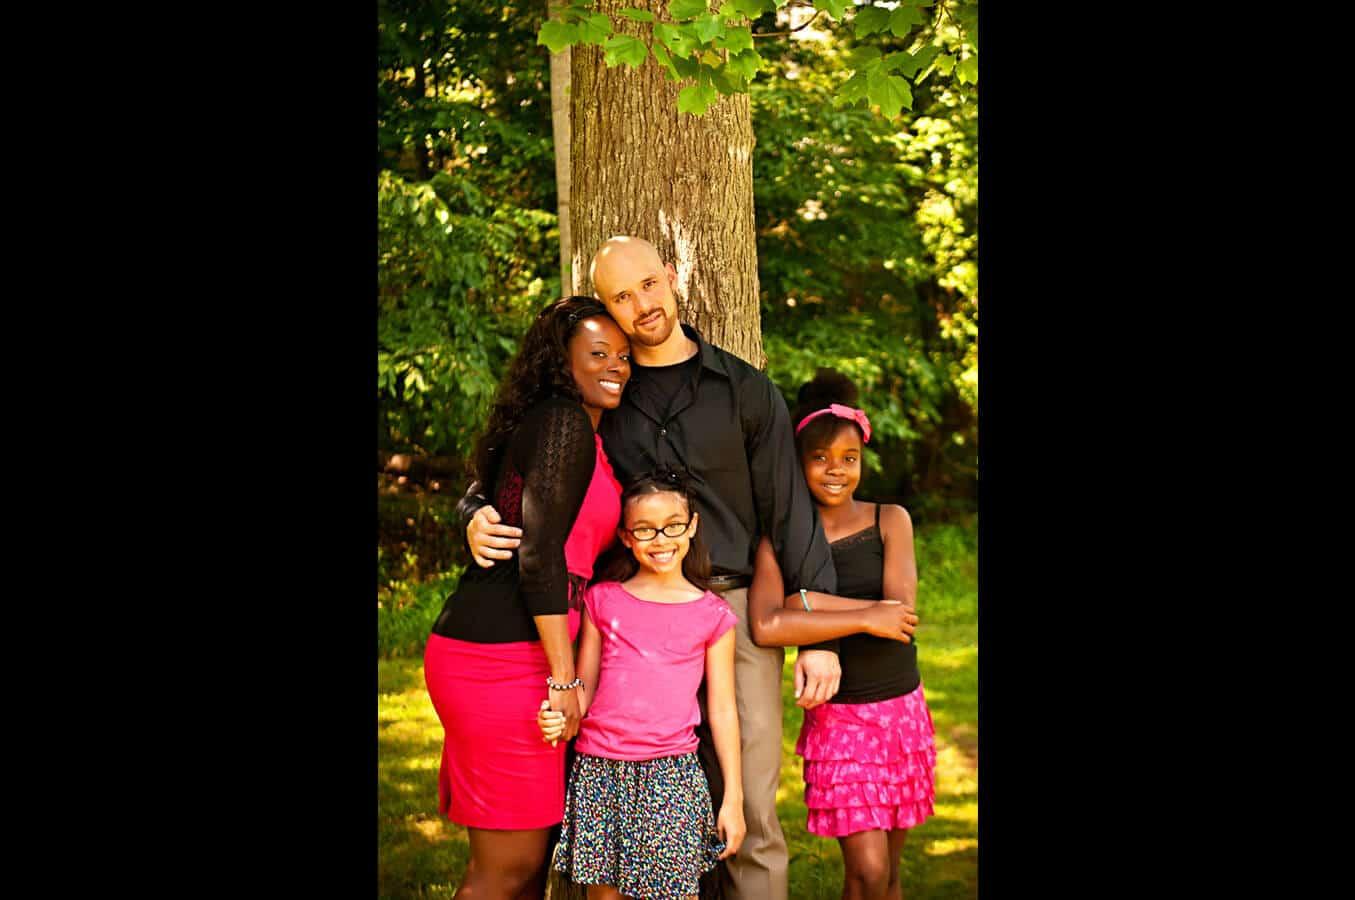 family portrait, outdoor, trees, natural light, Northern VA